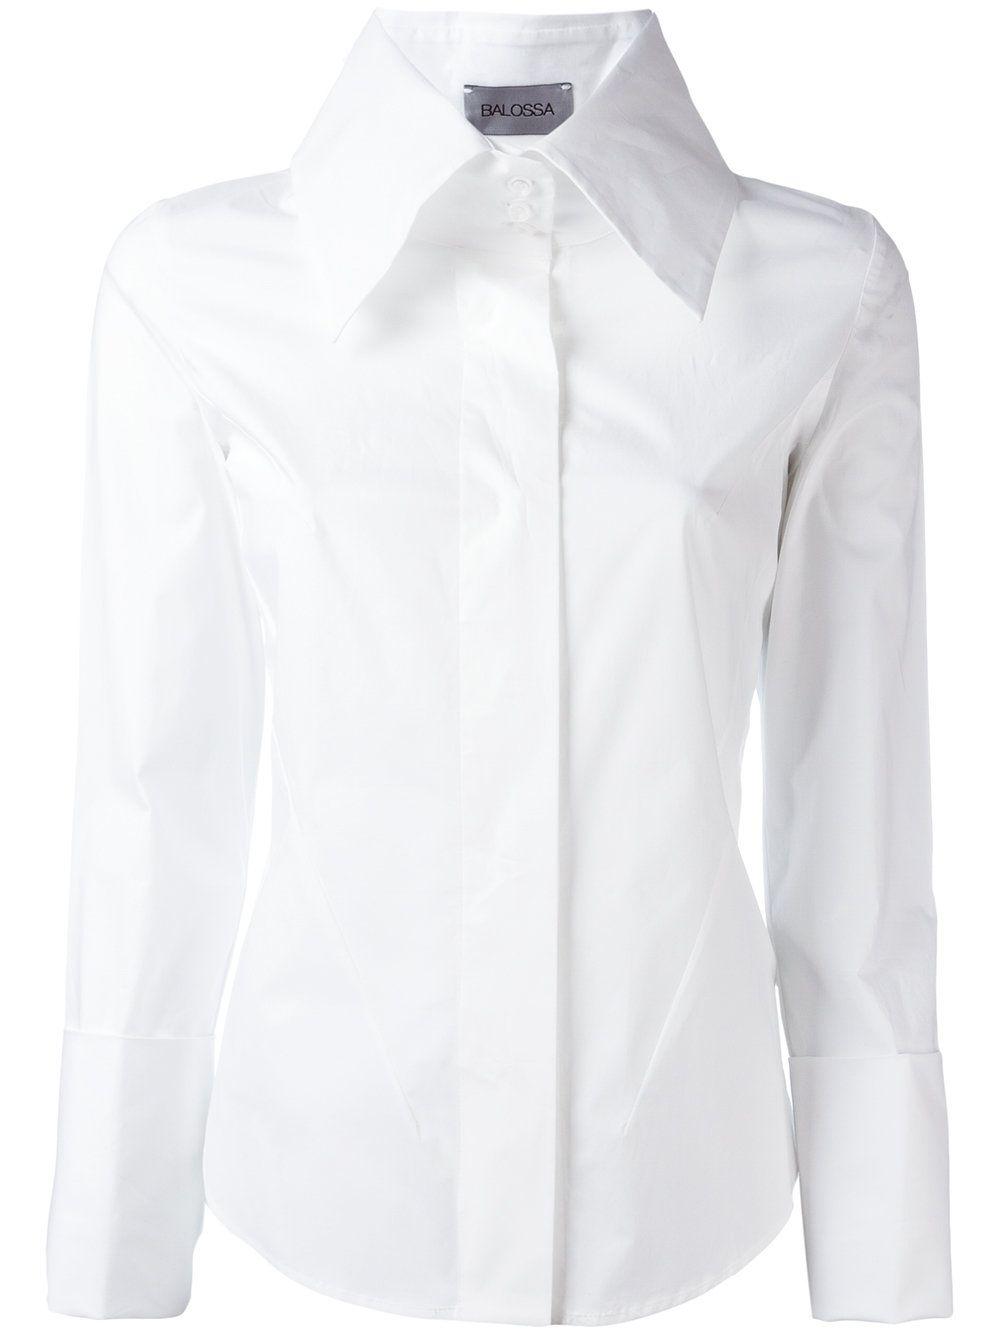 Balossa White Shirt Wide Collar Shirt White Collared Shirt Womens Dress Shirts For Women Collar Shirts Women [ 1334 x 1000 Pixel ]